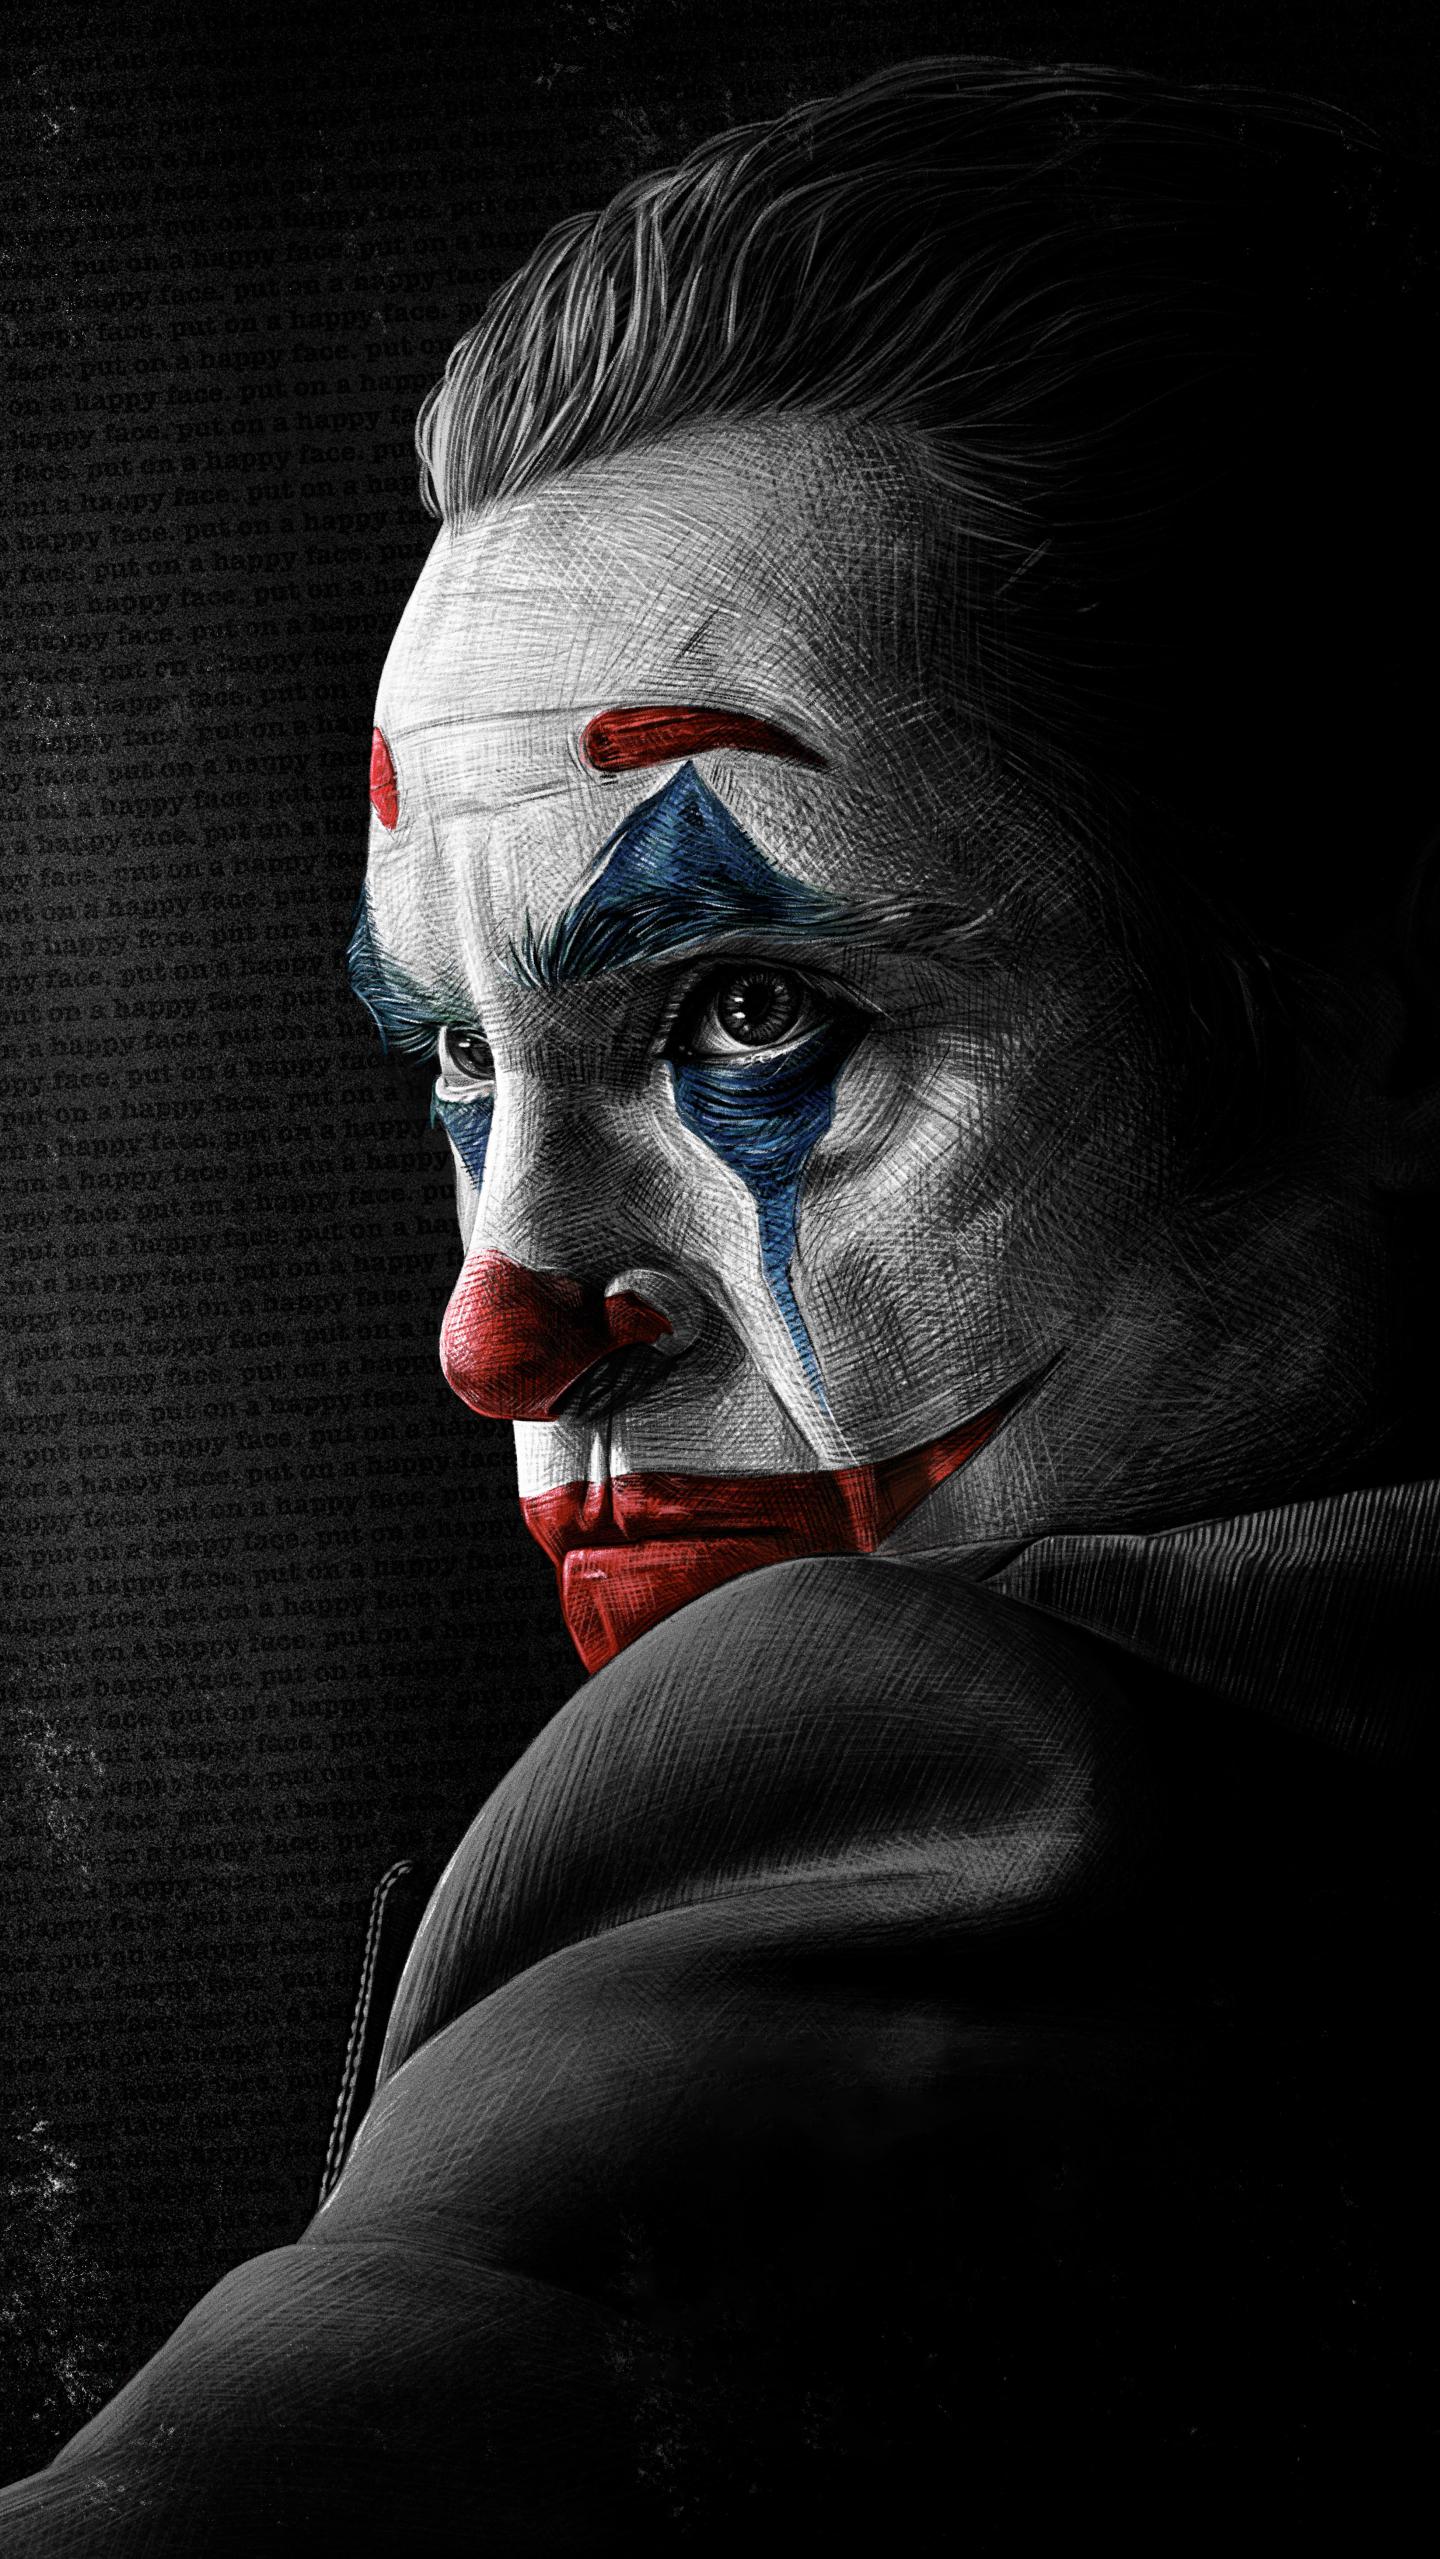 1440x2560 4k Joaquin Phoenix As Joker Samsung Galaxy S6,S7 ...